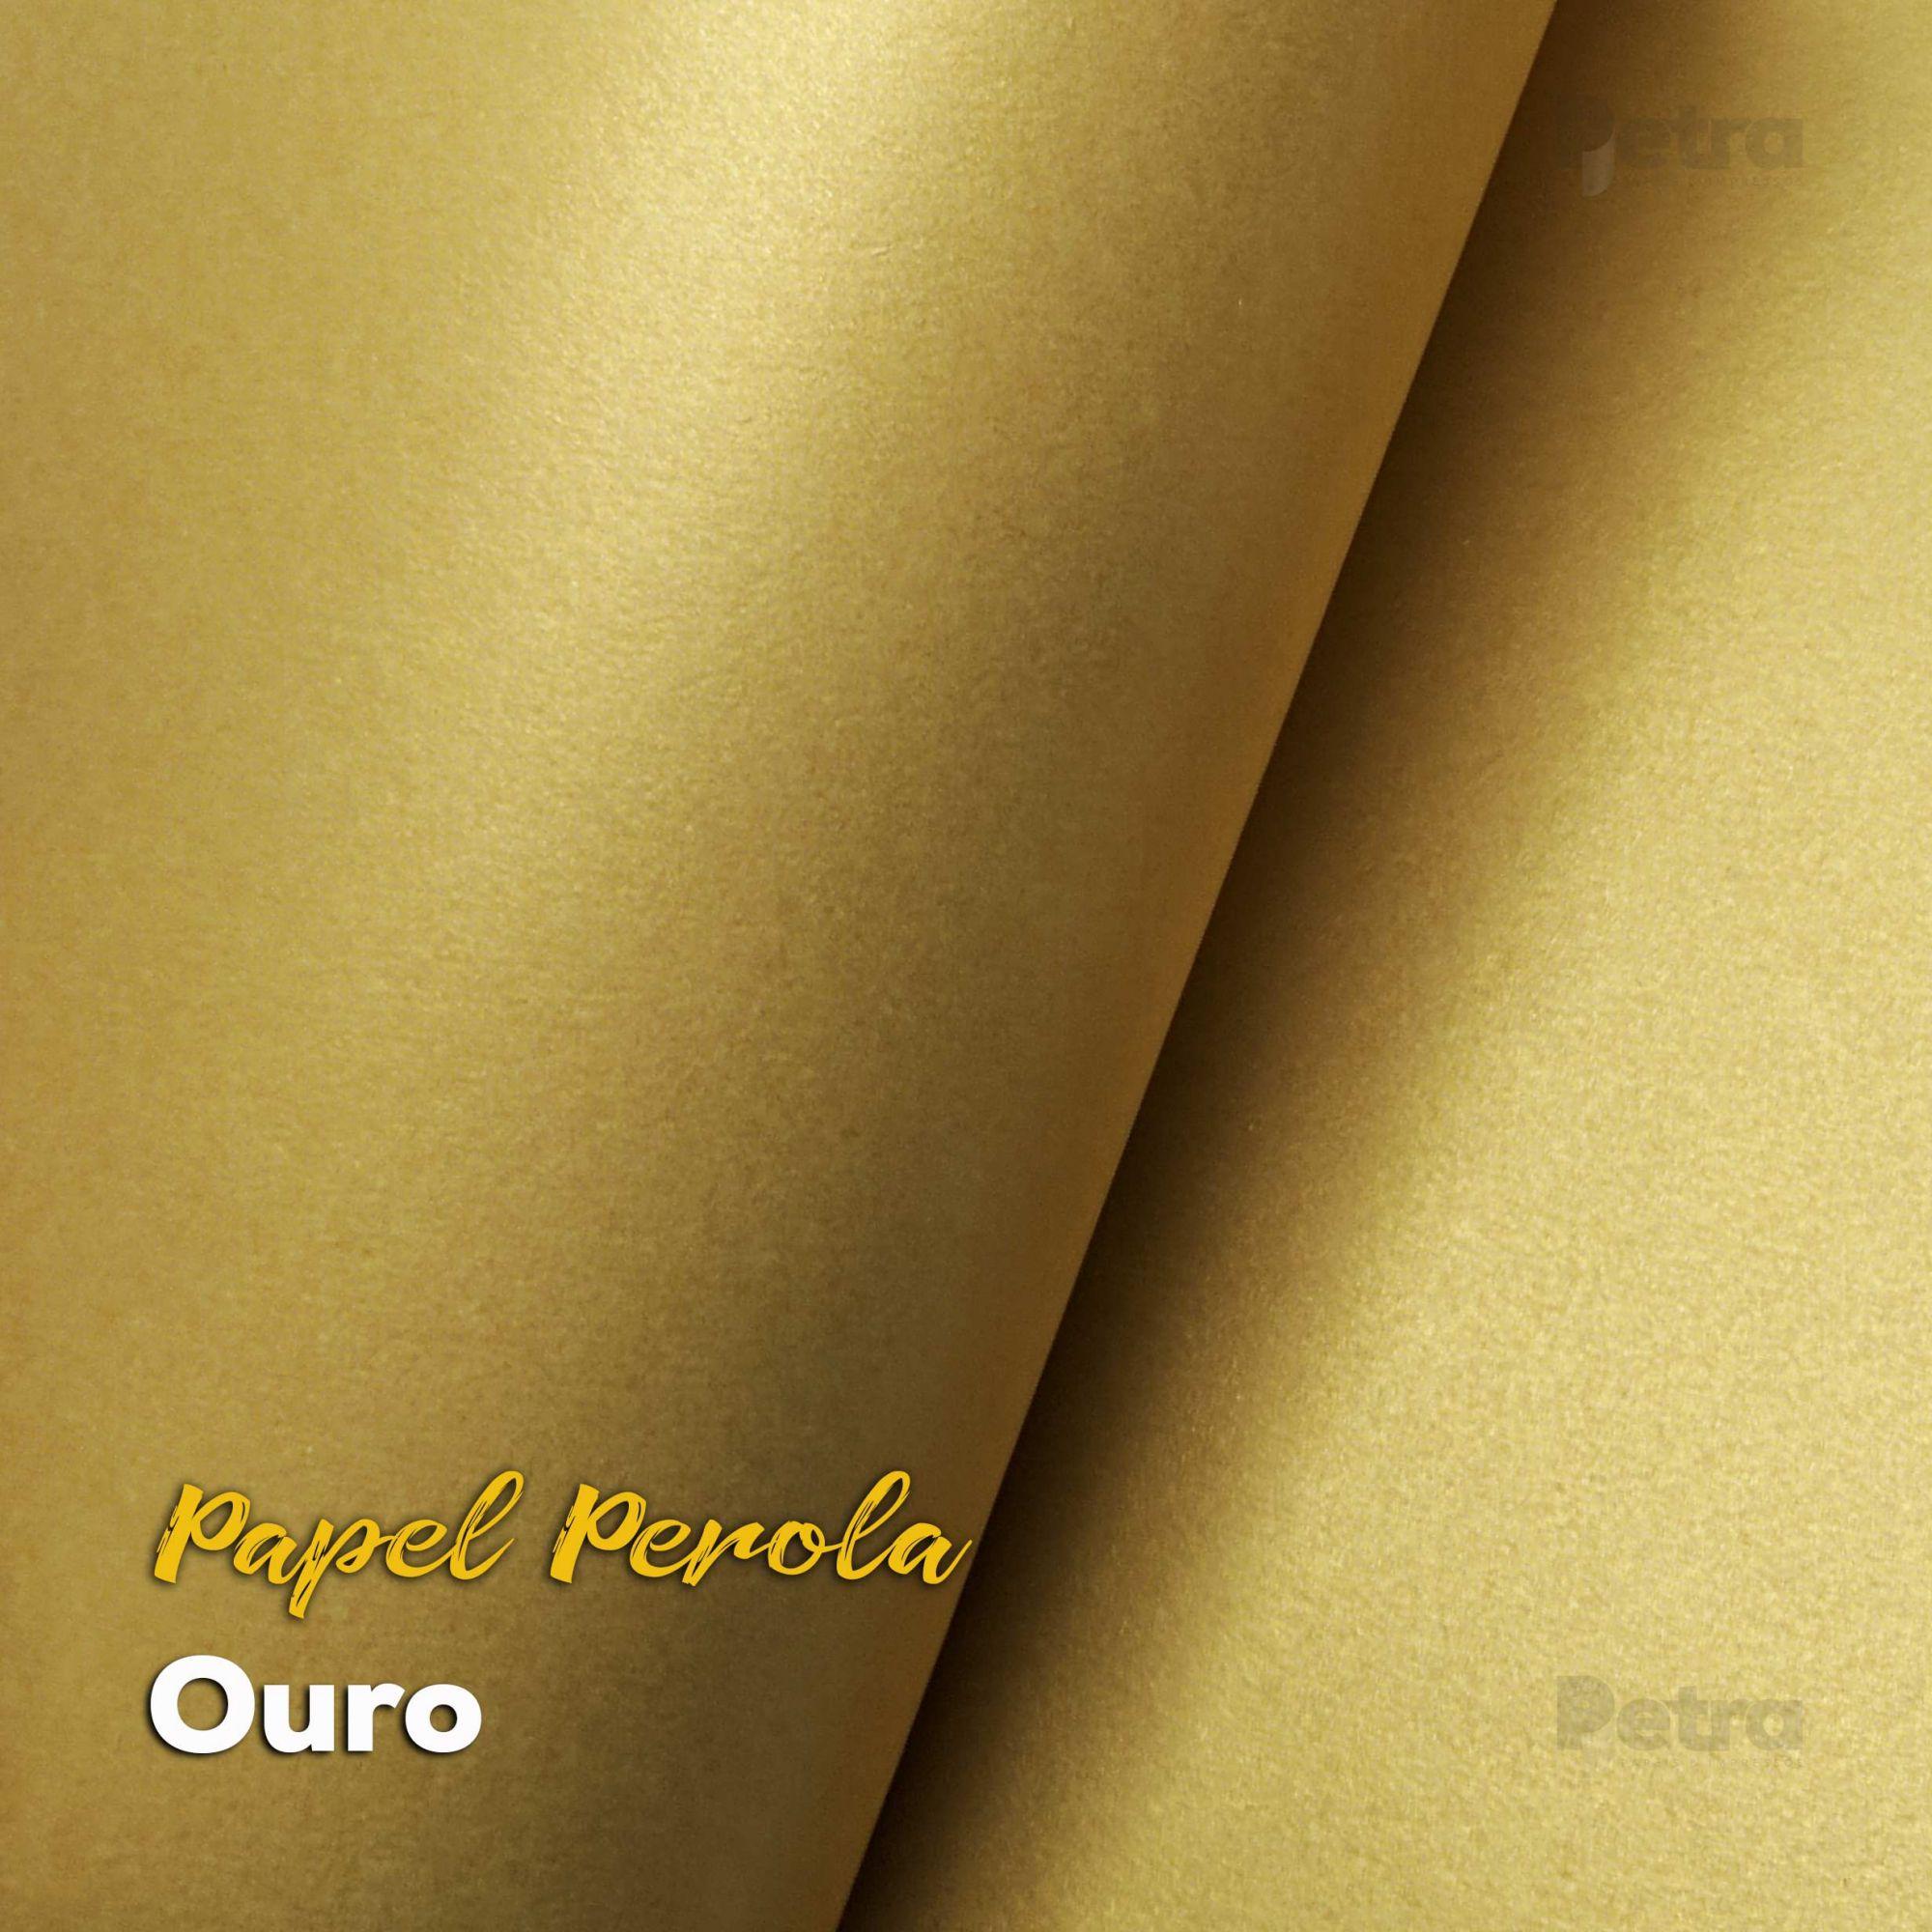 Papel Pérola Ouro Tam: A4 180g/m²